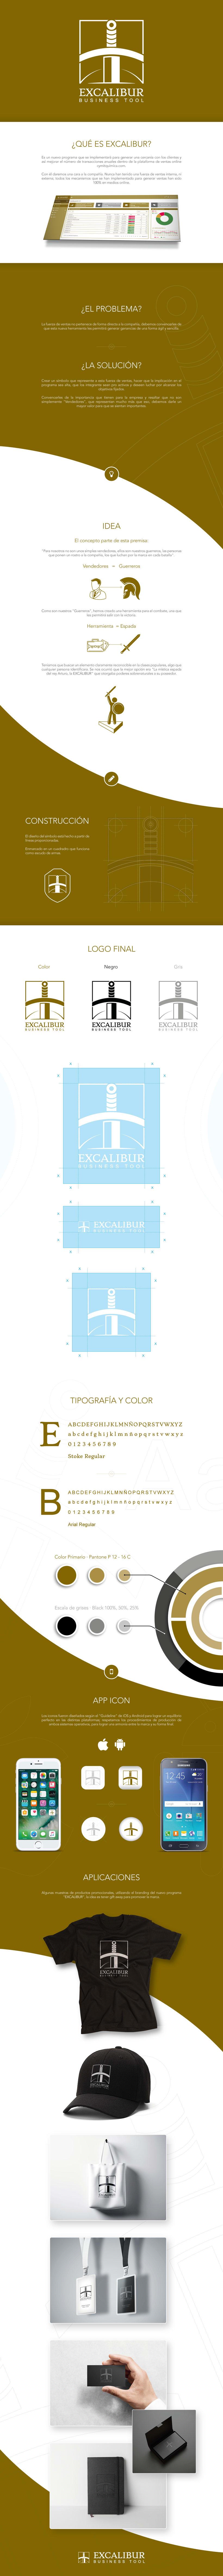 Excalibur Business Tool -1